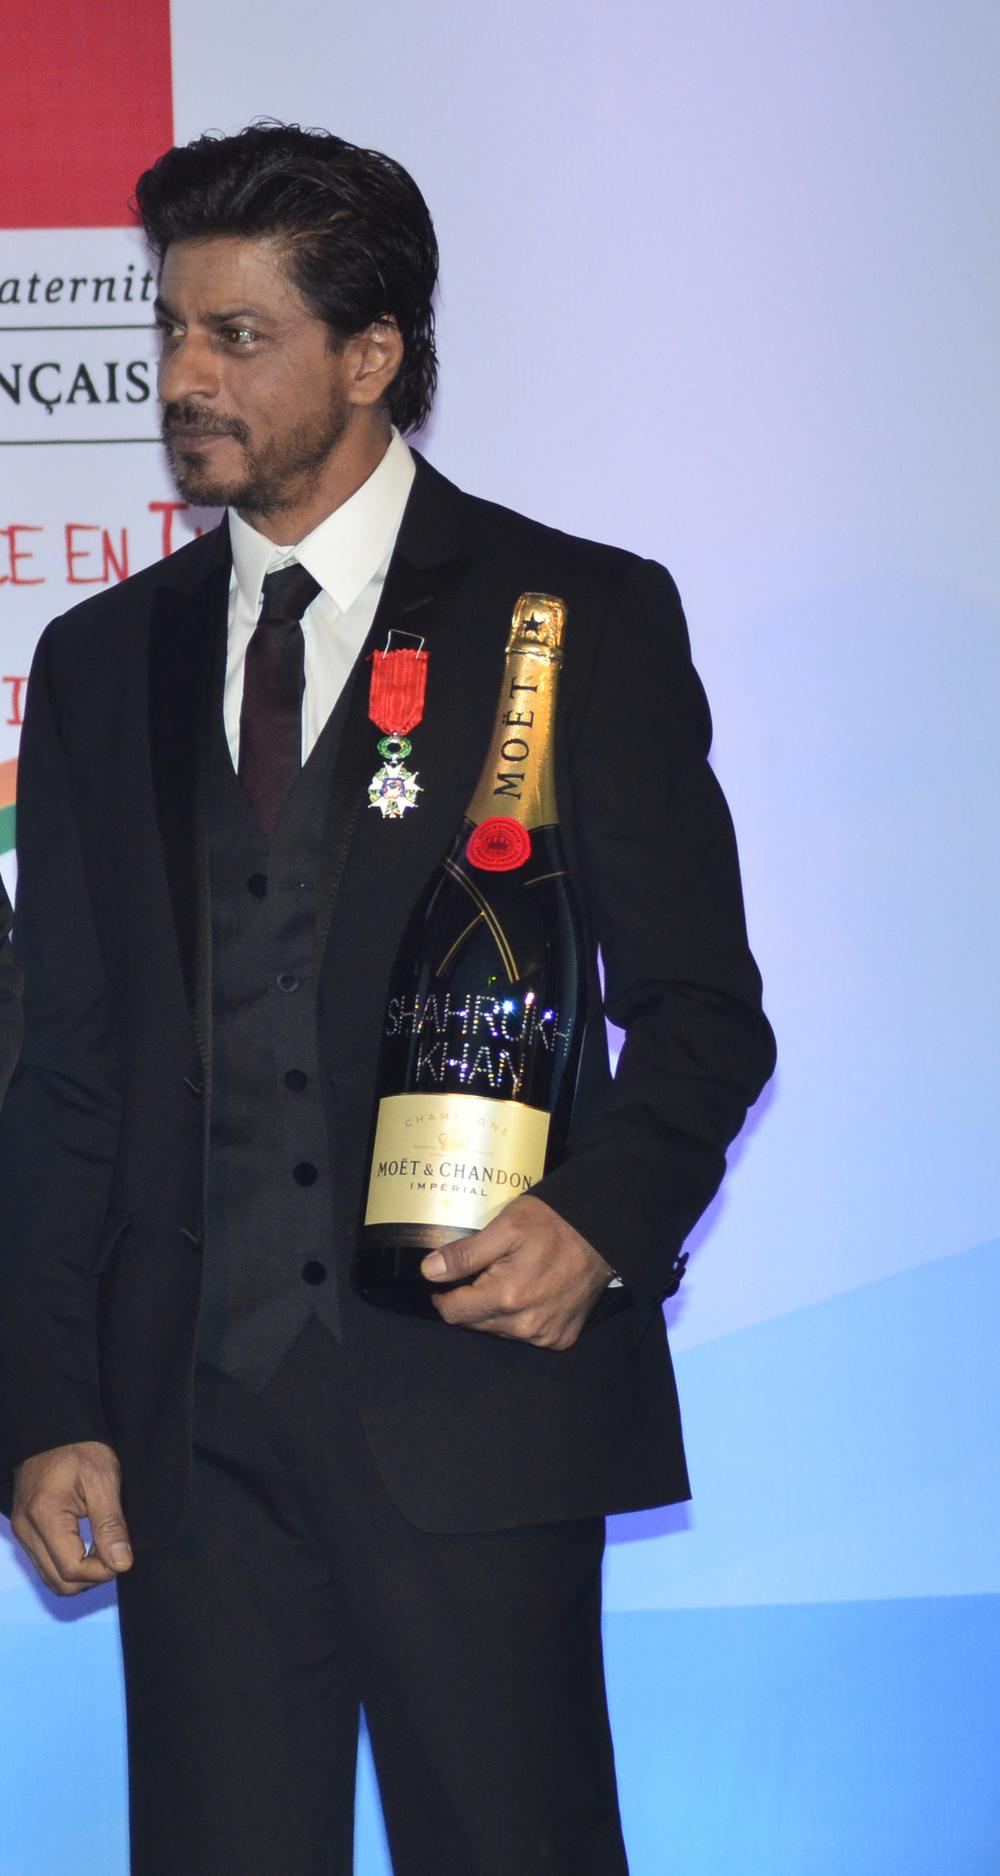 Shah Rukh Khan holding the Moet & Chandon customized Jeroboam.jpg